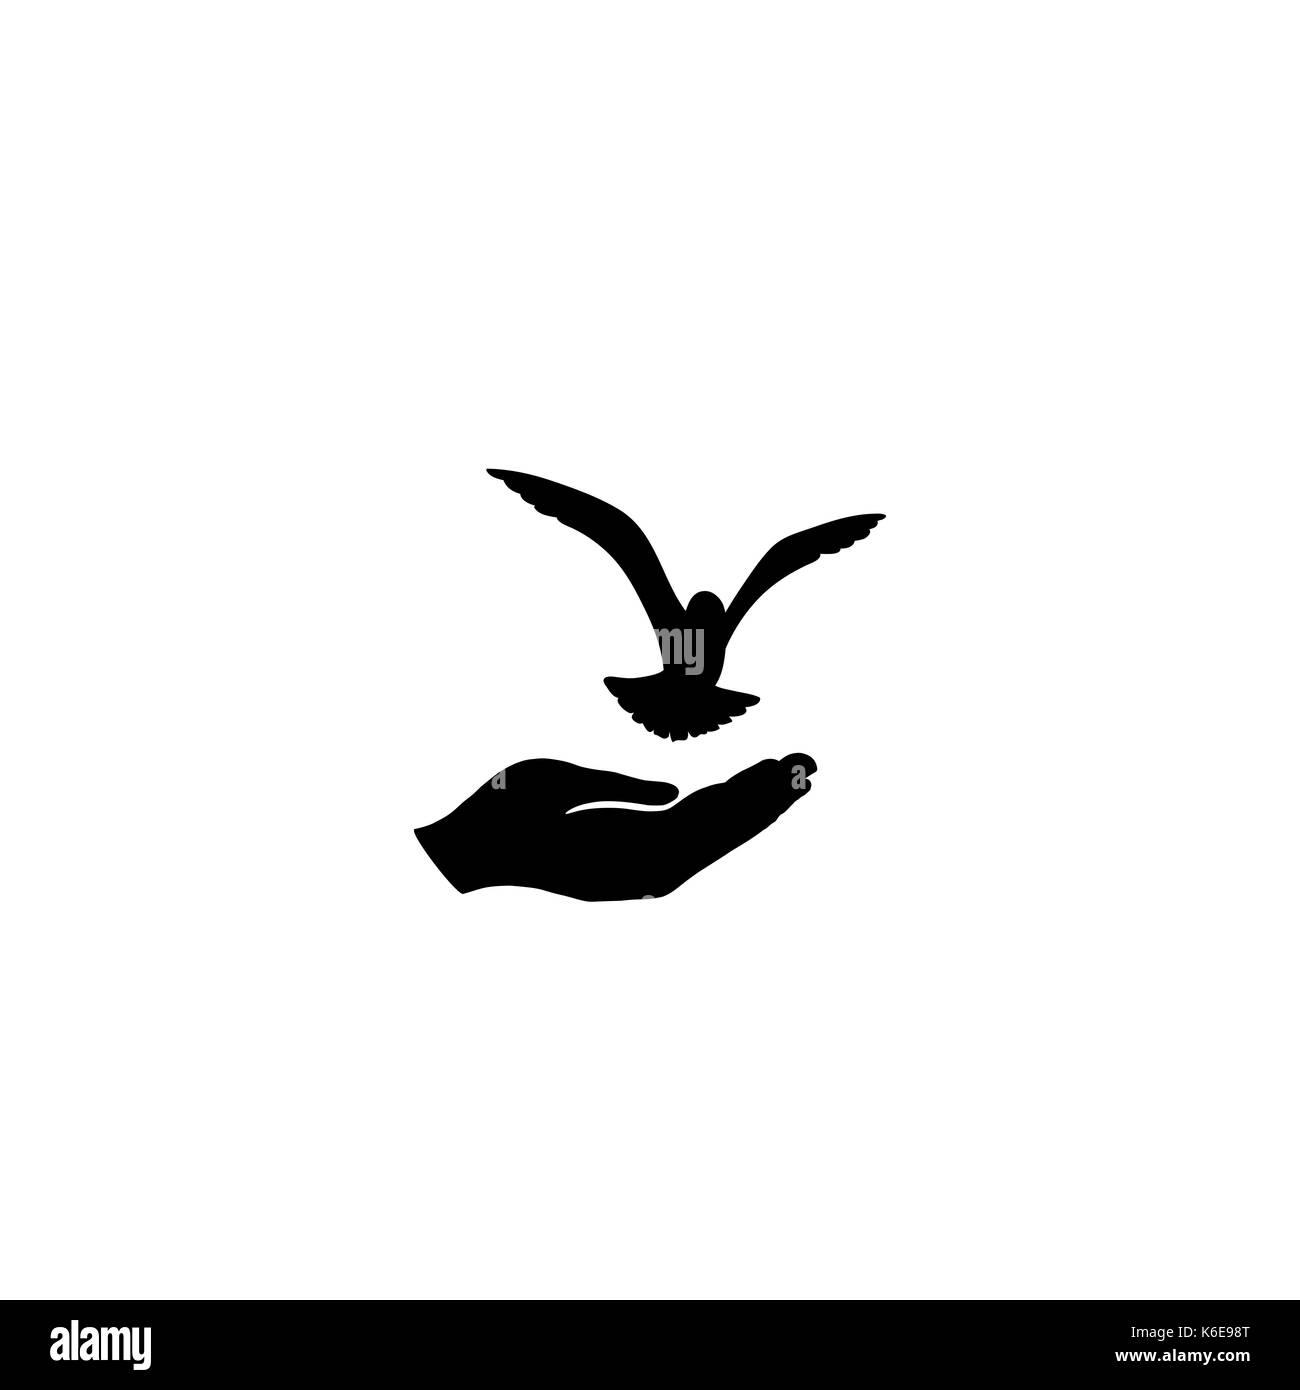 Dove bird peace sign - photo#55